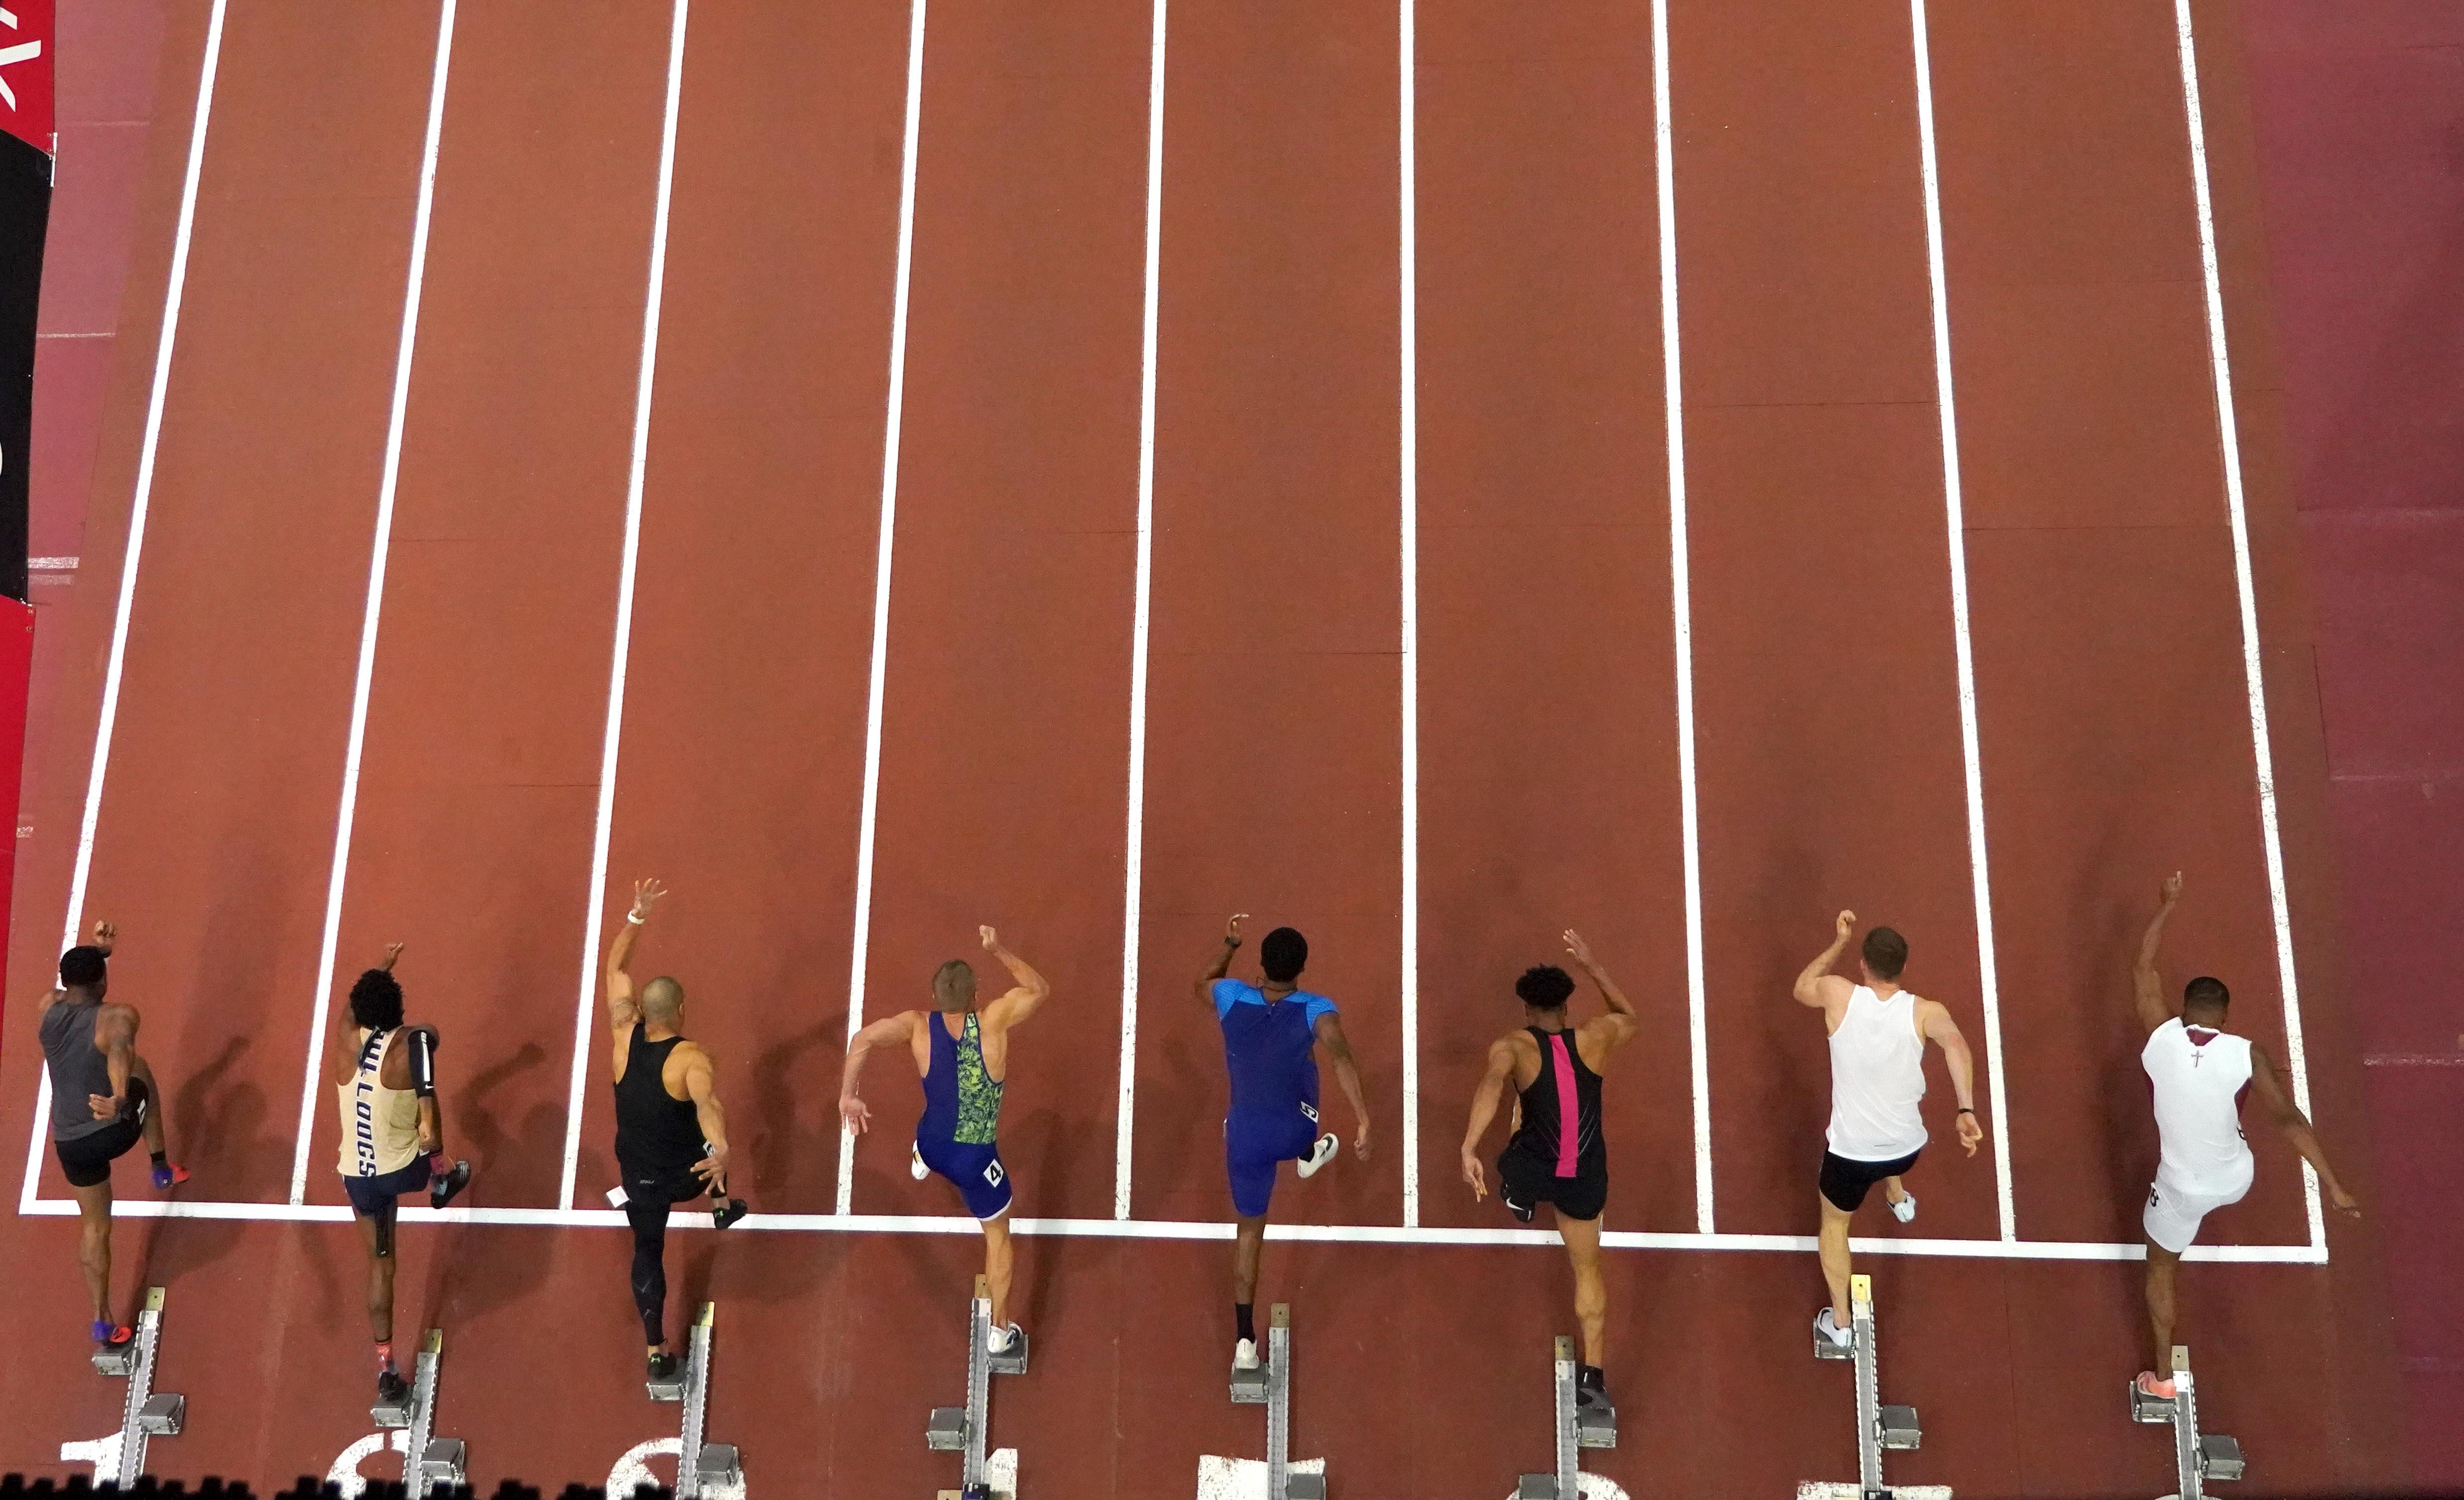 Track & Field: USATF Indoor Championships